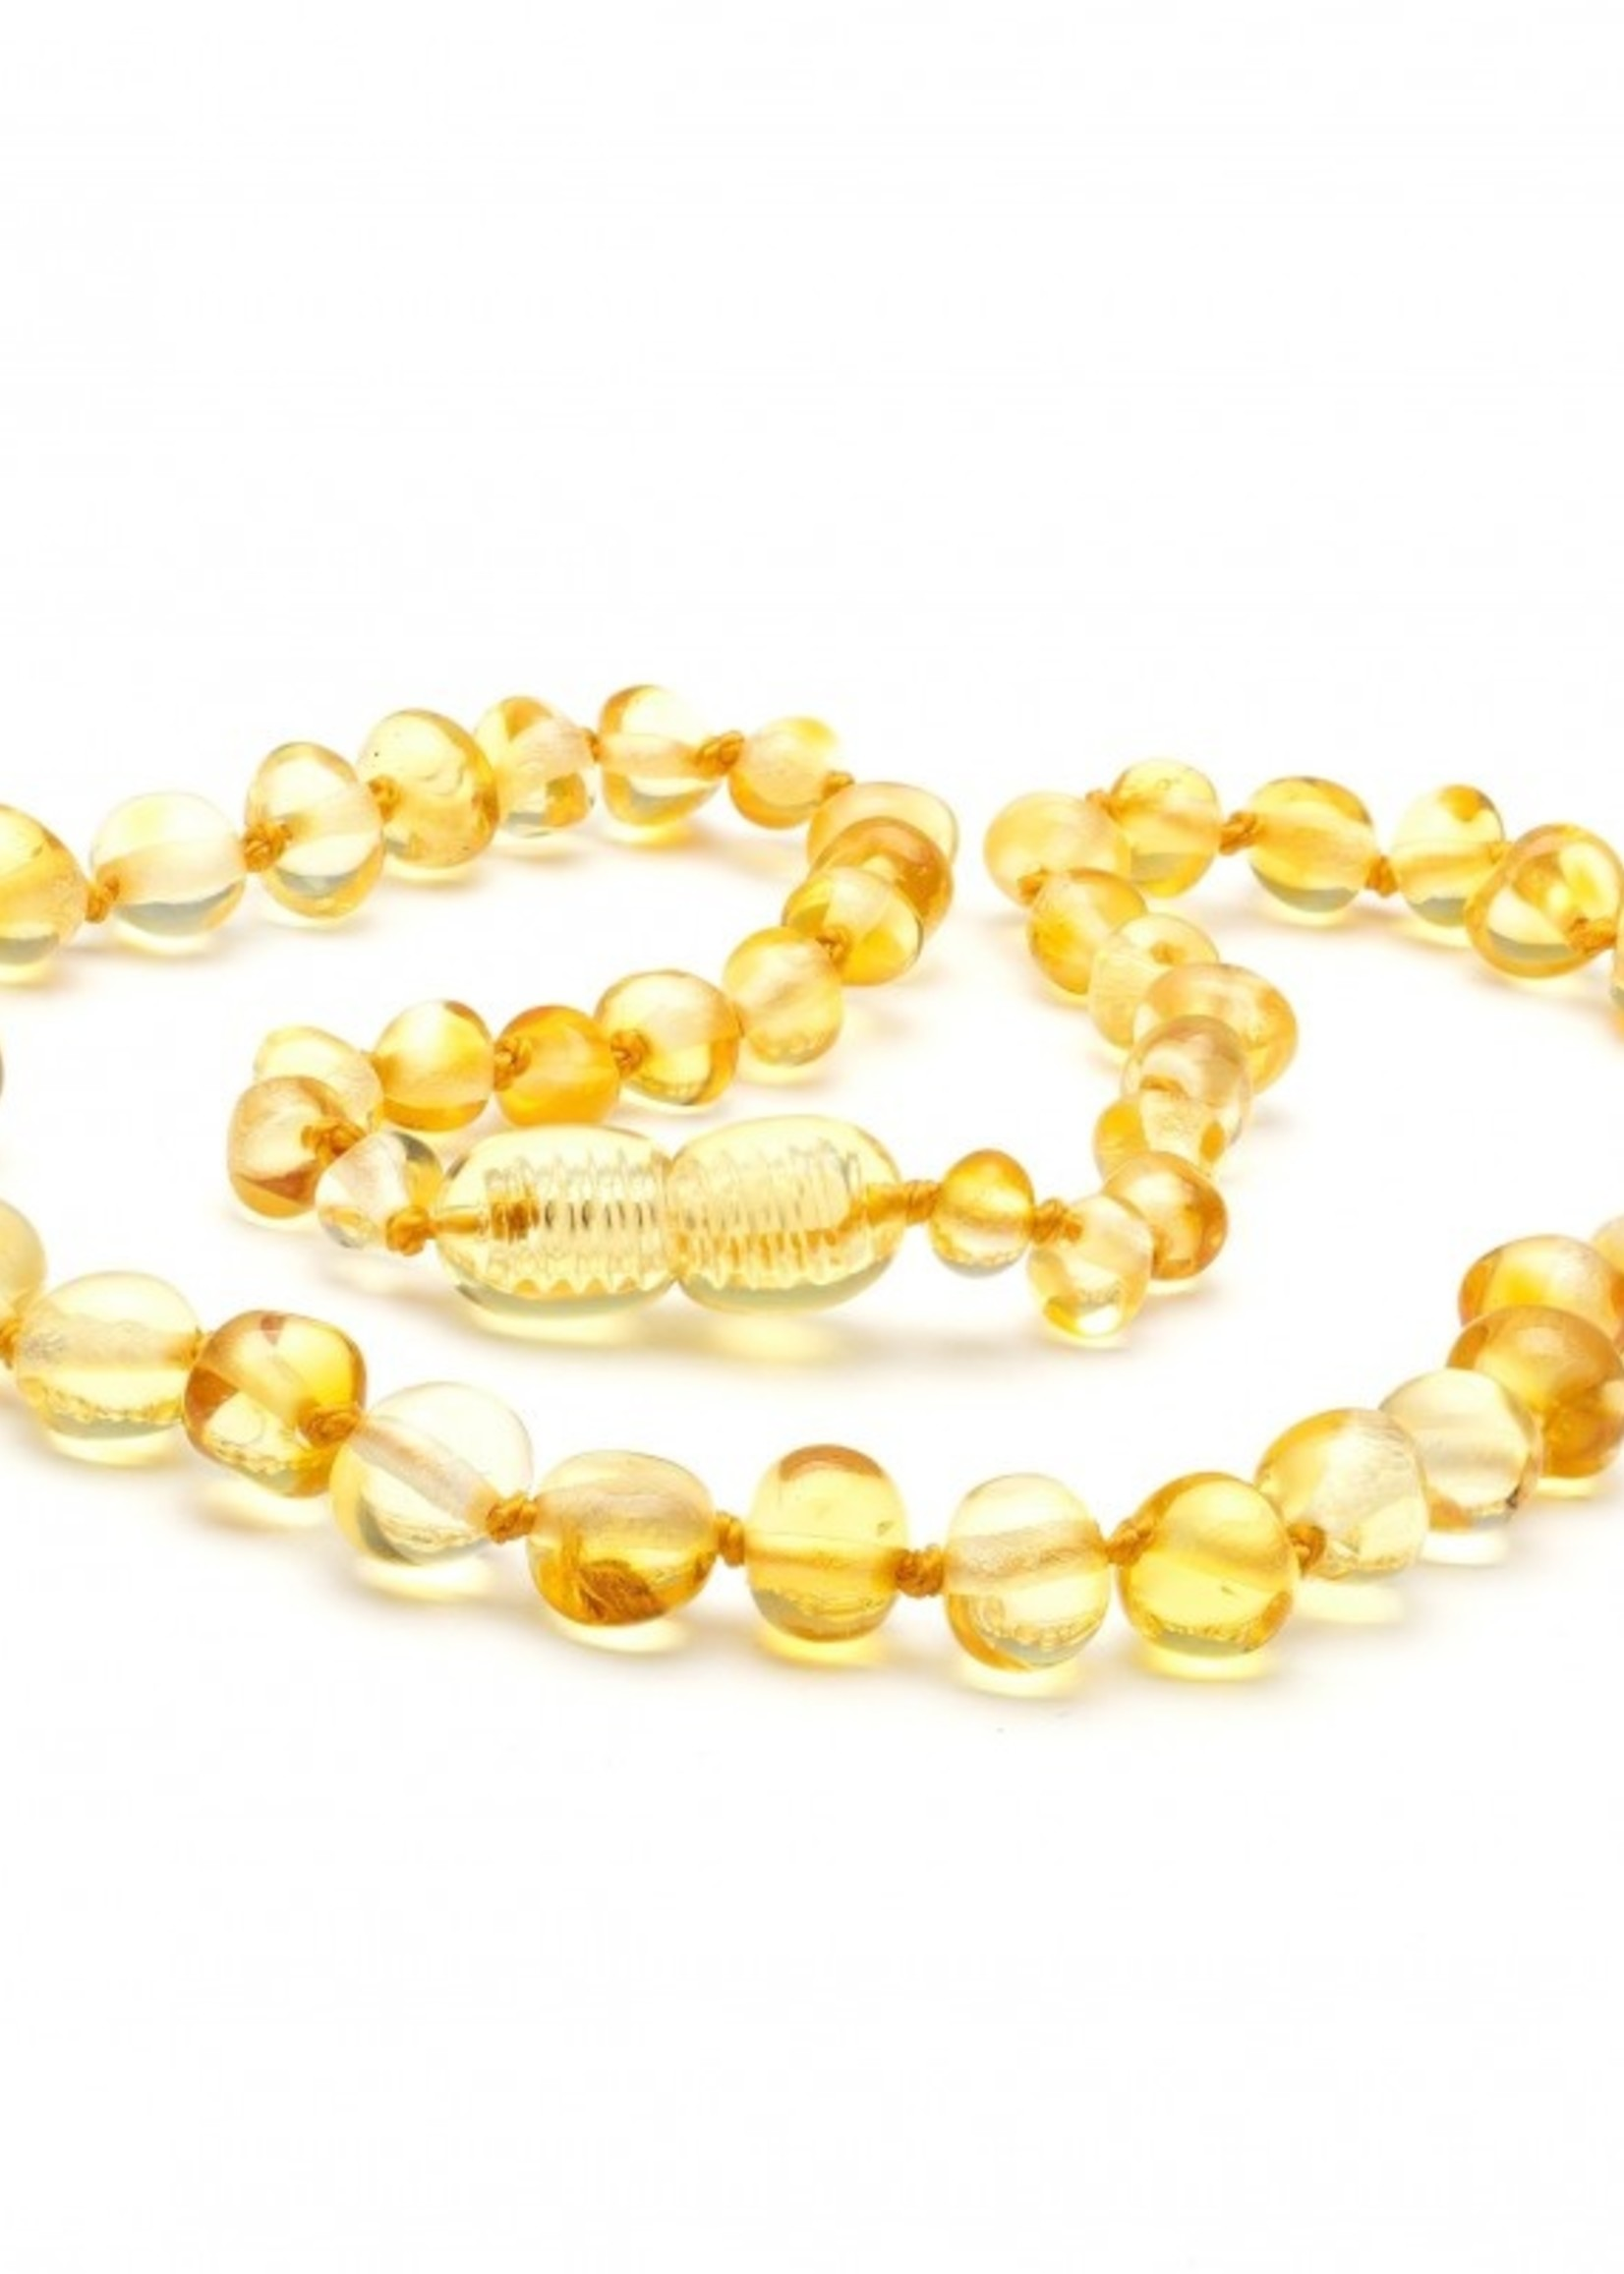 Amber Baroque Amber Teething Necklace - Lemon